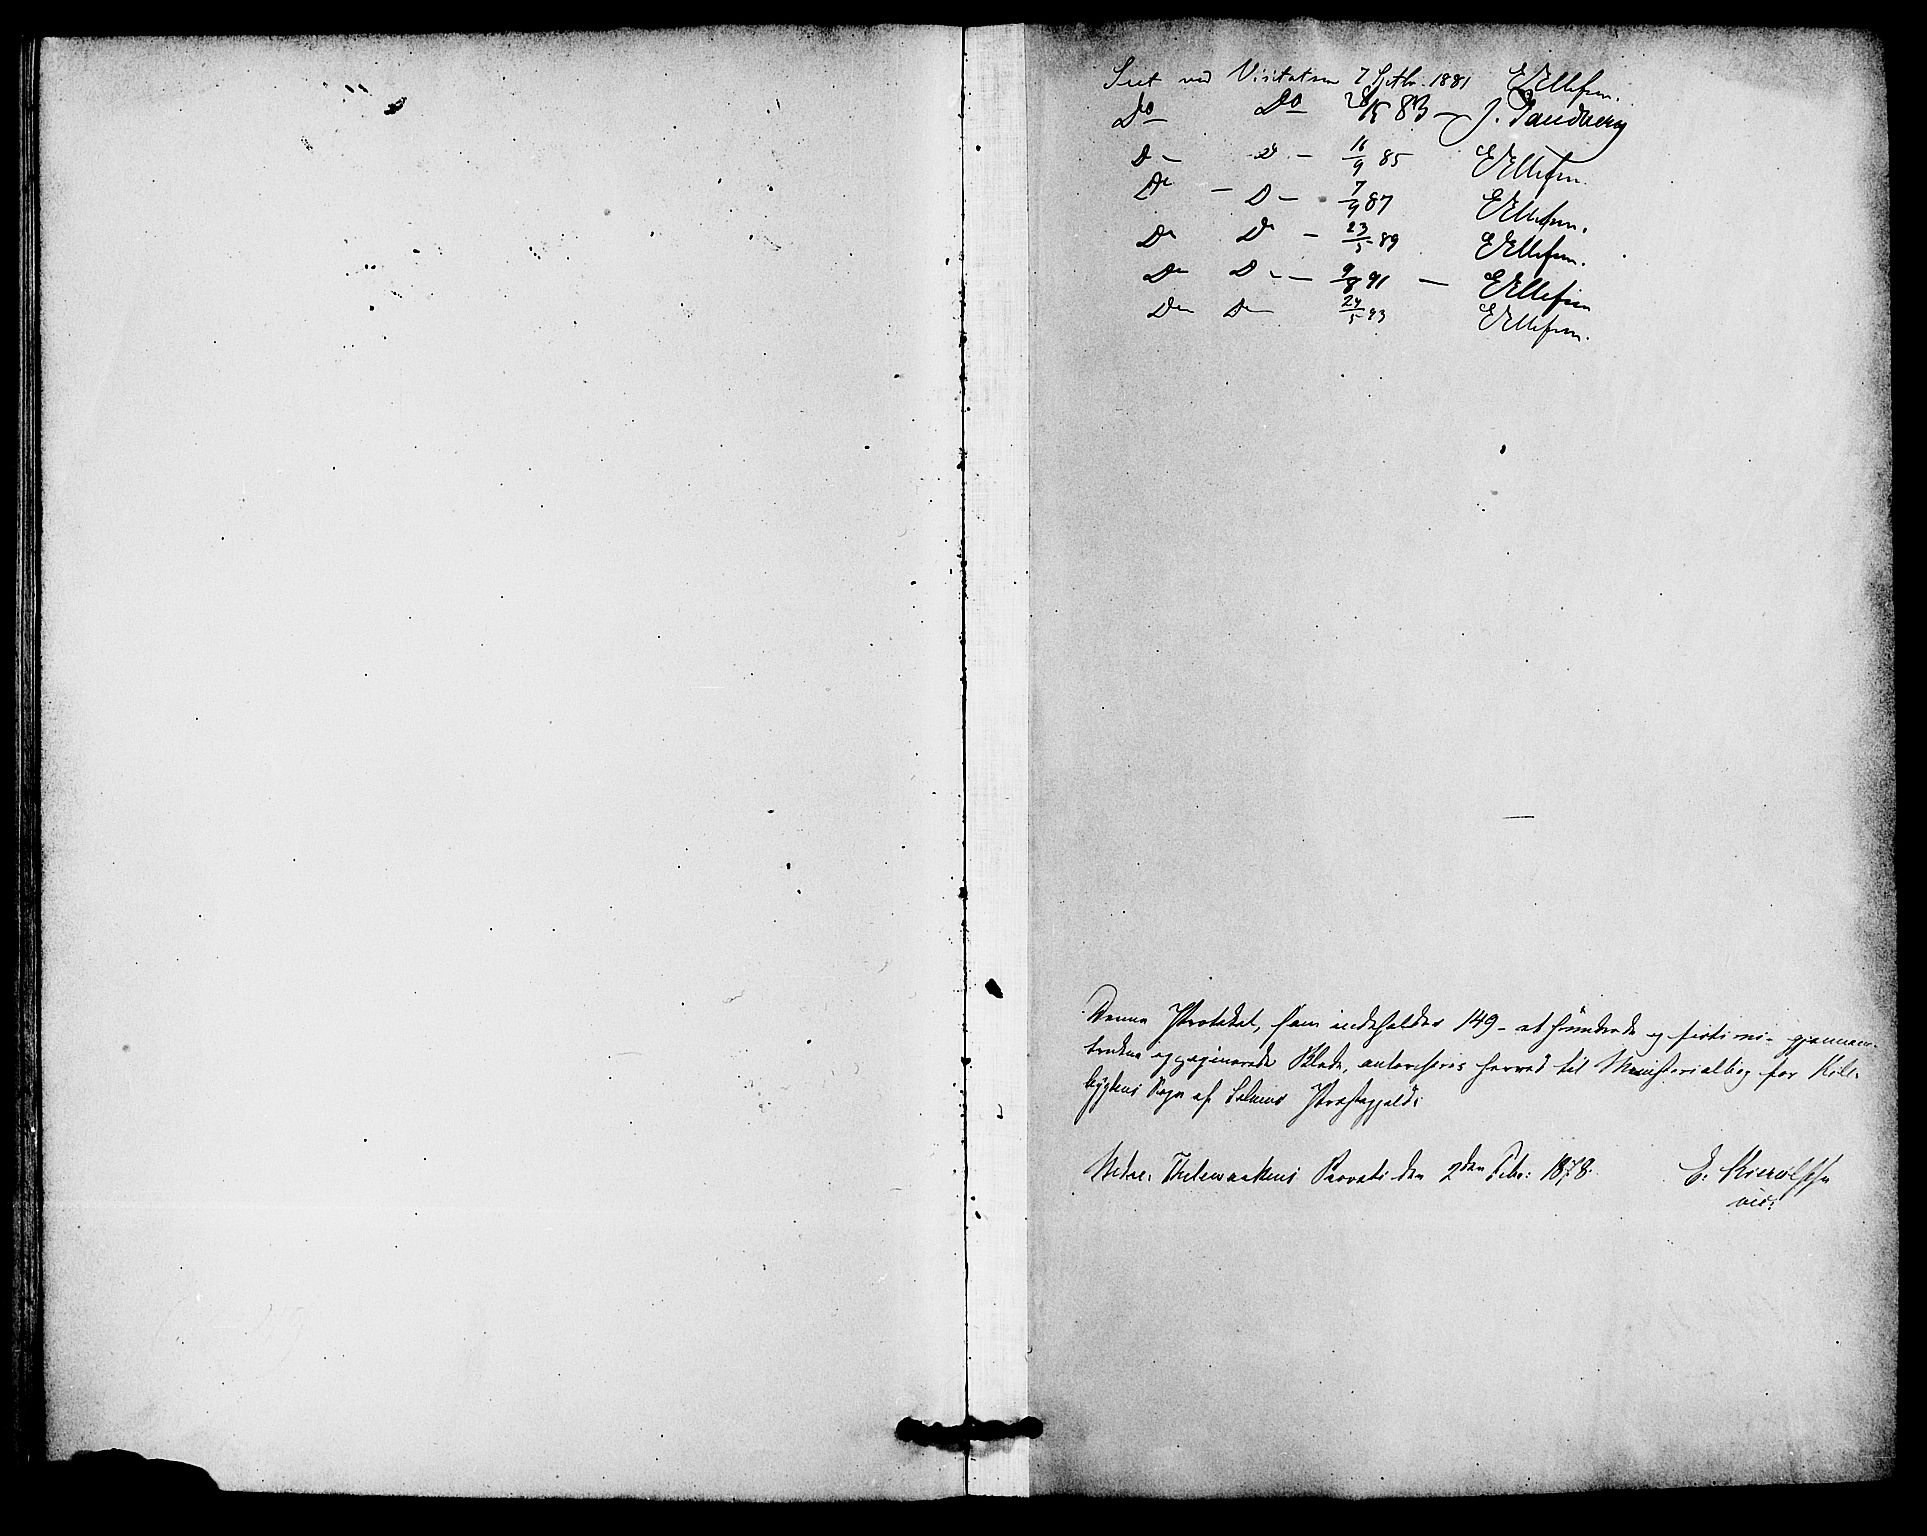 SAKO, Solum kirkebøker, F/Fc/L0001: Ministerialbok nr. III 1, 1877-1891